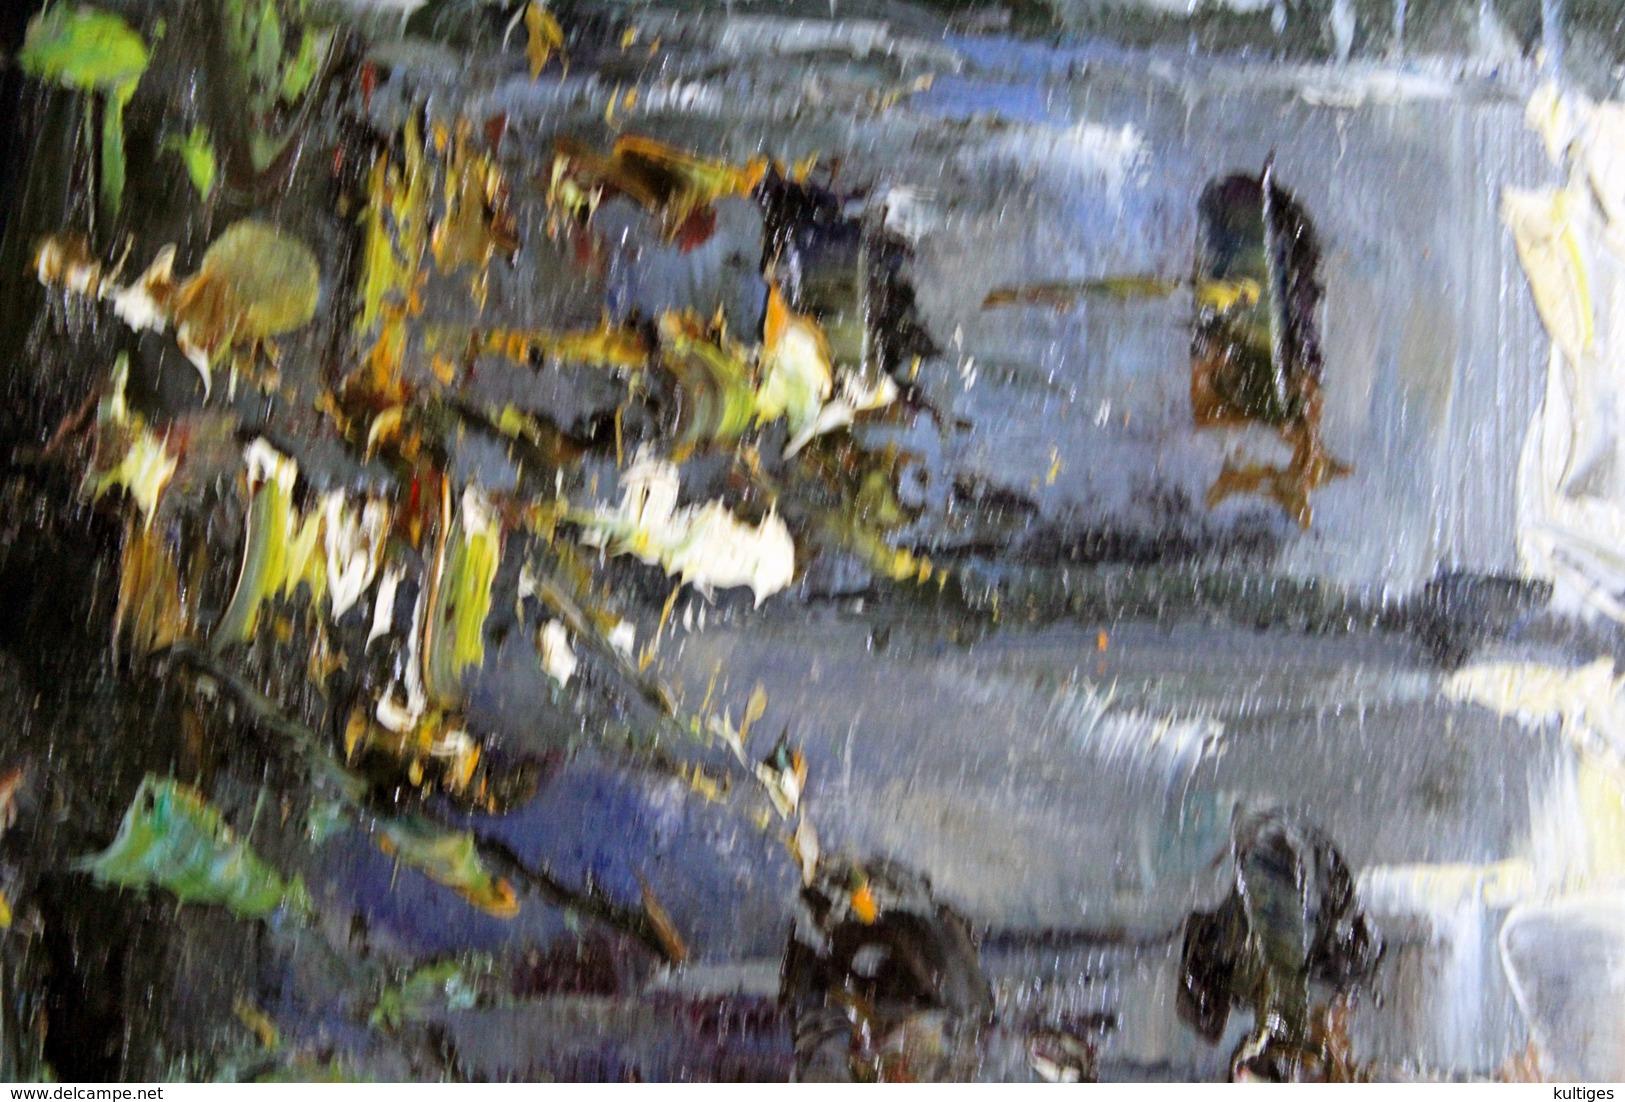 Randall Davey (Amerika, 1887-1964) - Paris - 1930 - Oils